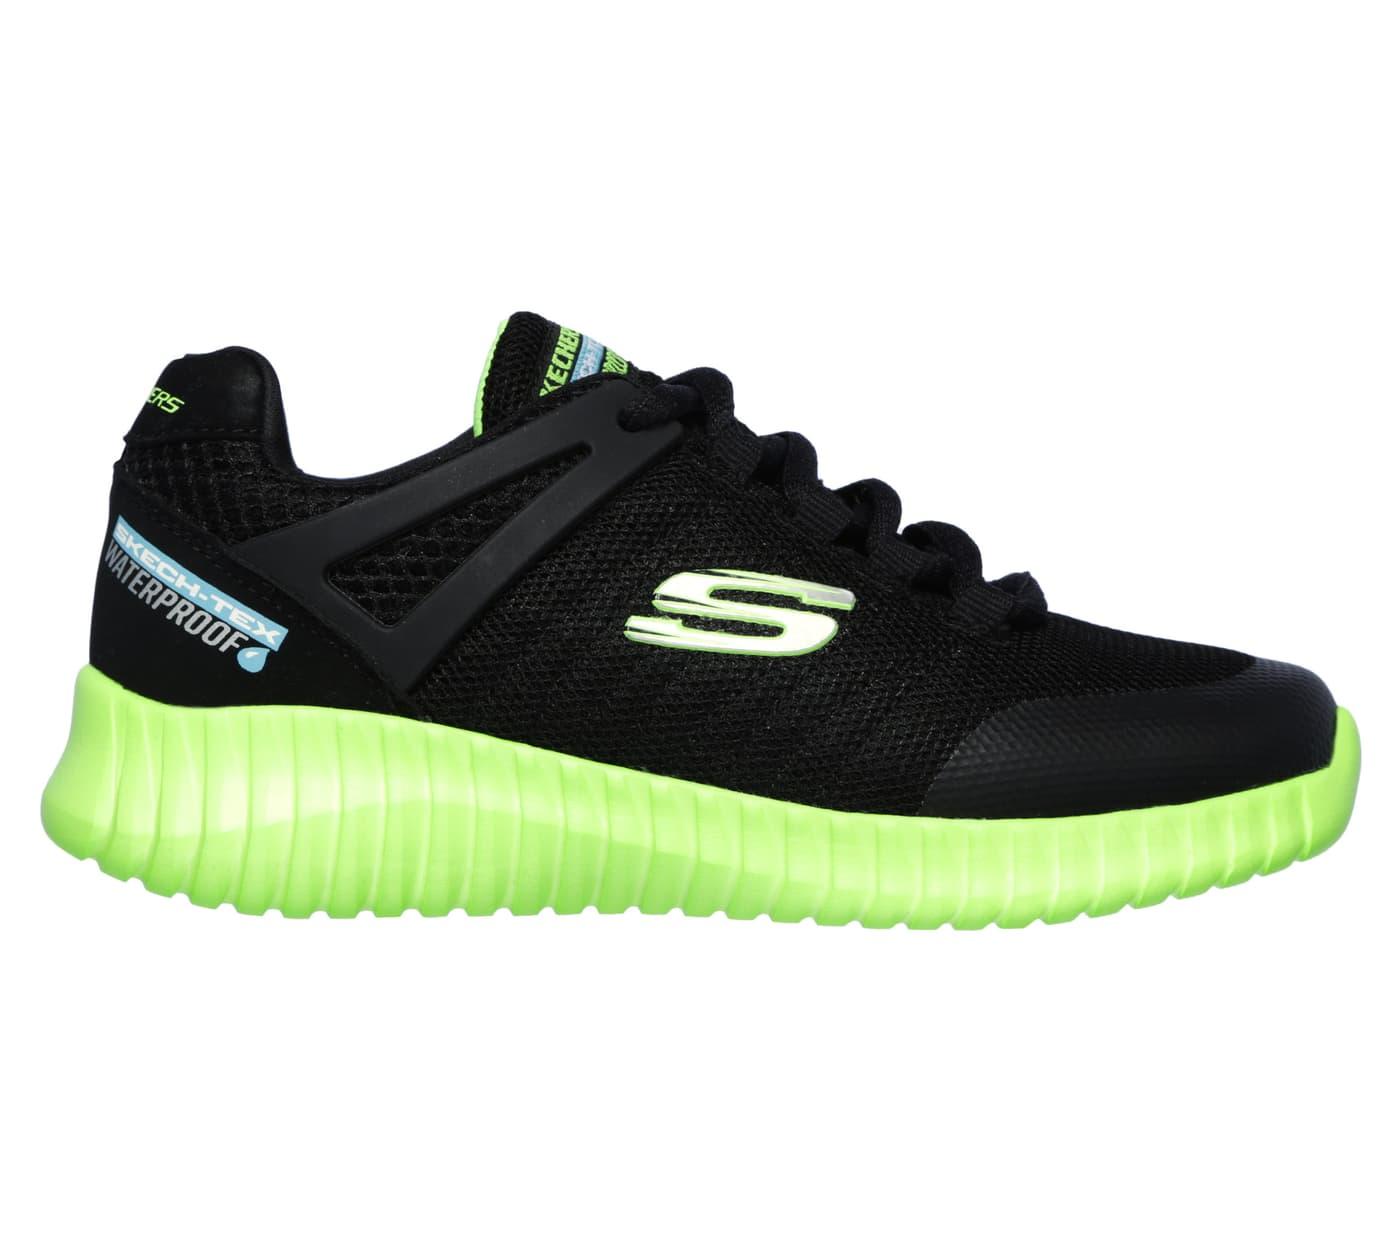 Skechers Elite Flex Waterproof Scarpa da bambino running